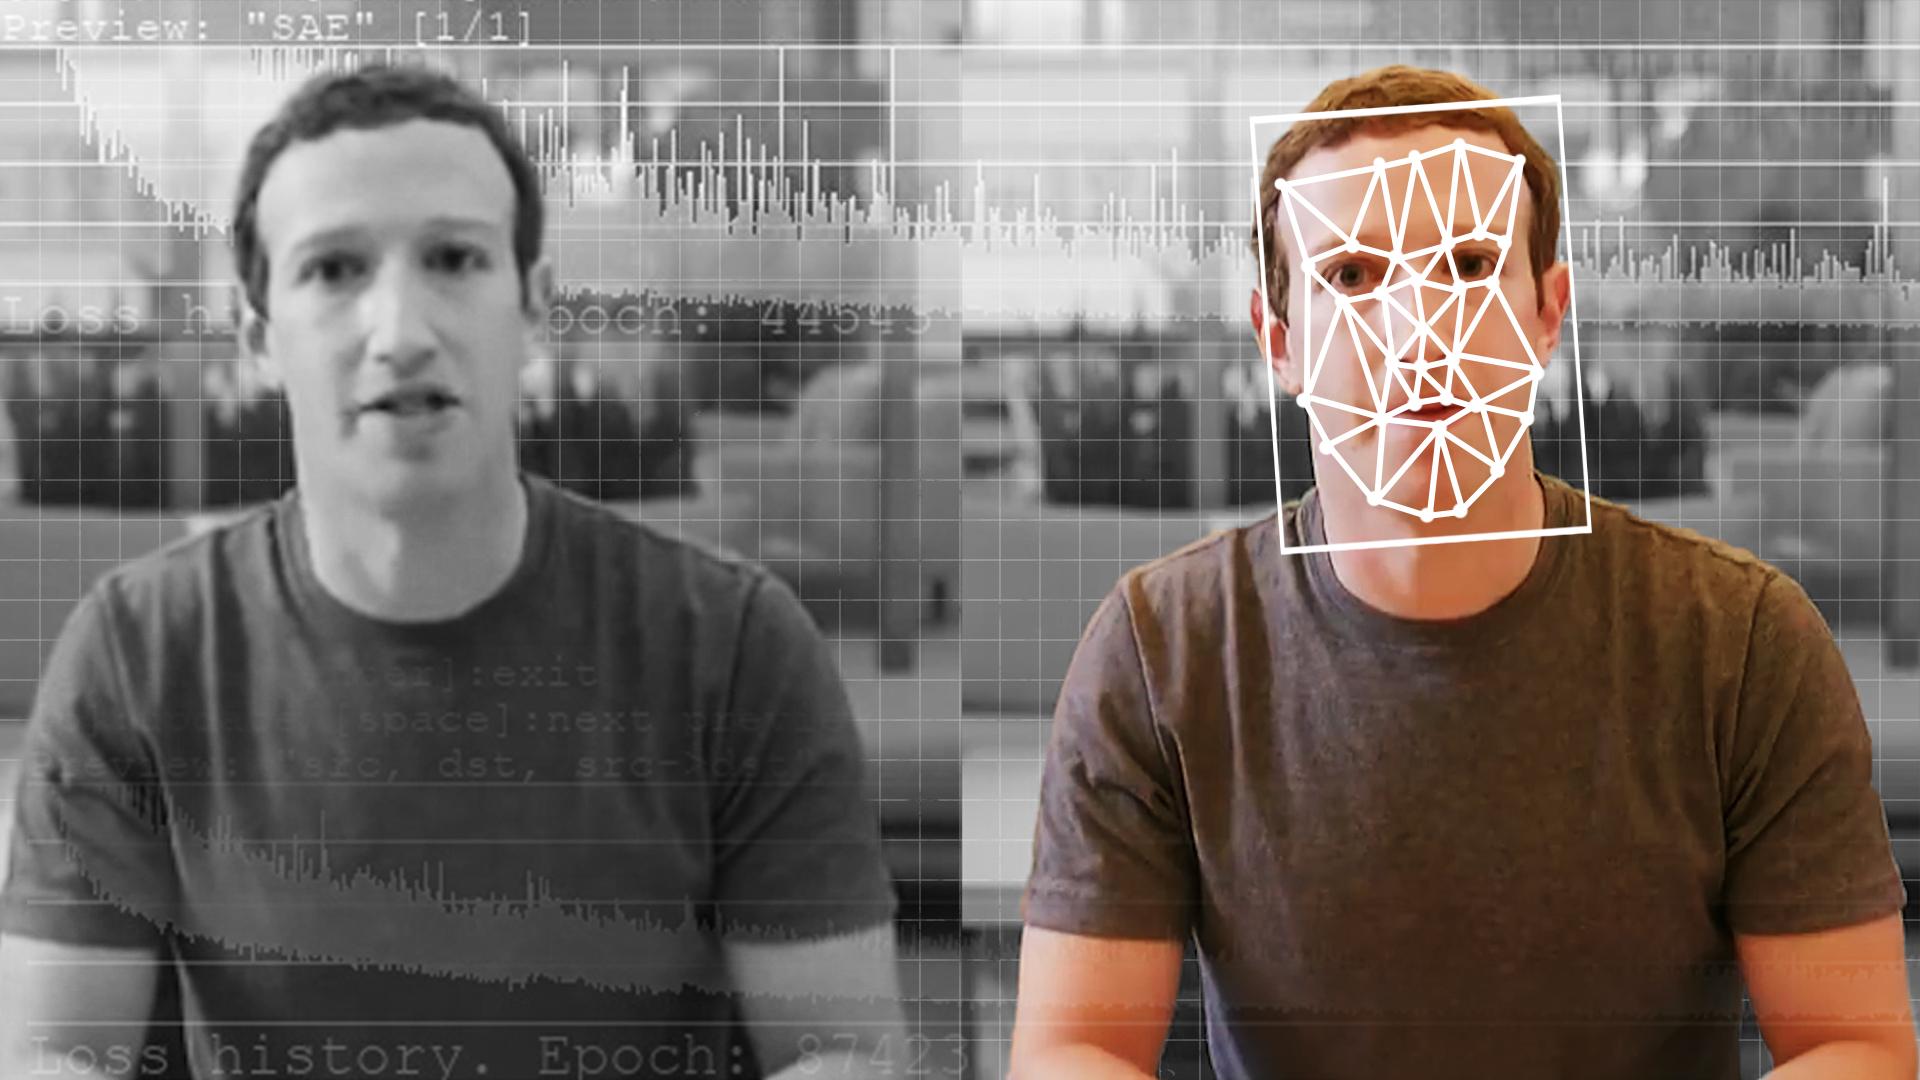 A comparison of an original and deepfake video of 6D彩票网开户 CEO Mark Zuckerberg